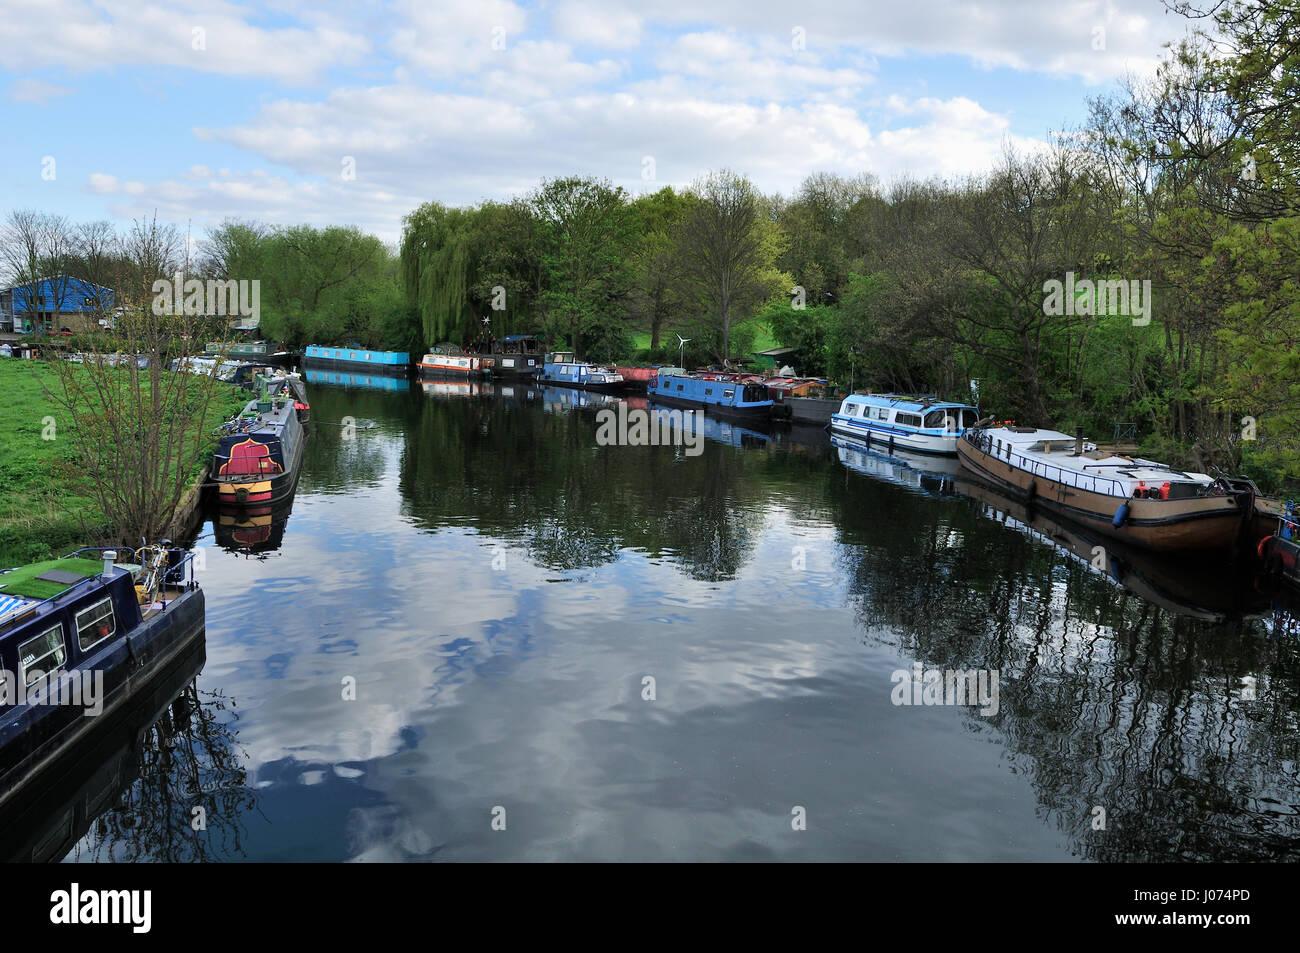 River Lea Navigation, near Springfield Park, North East London UK - Stock Image